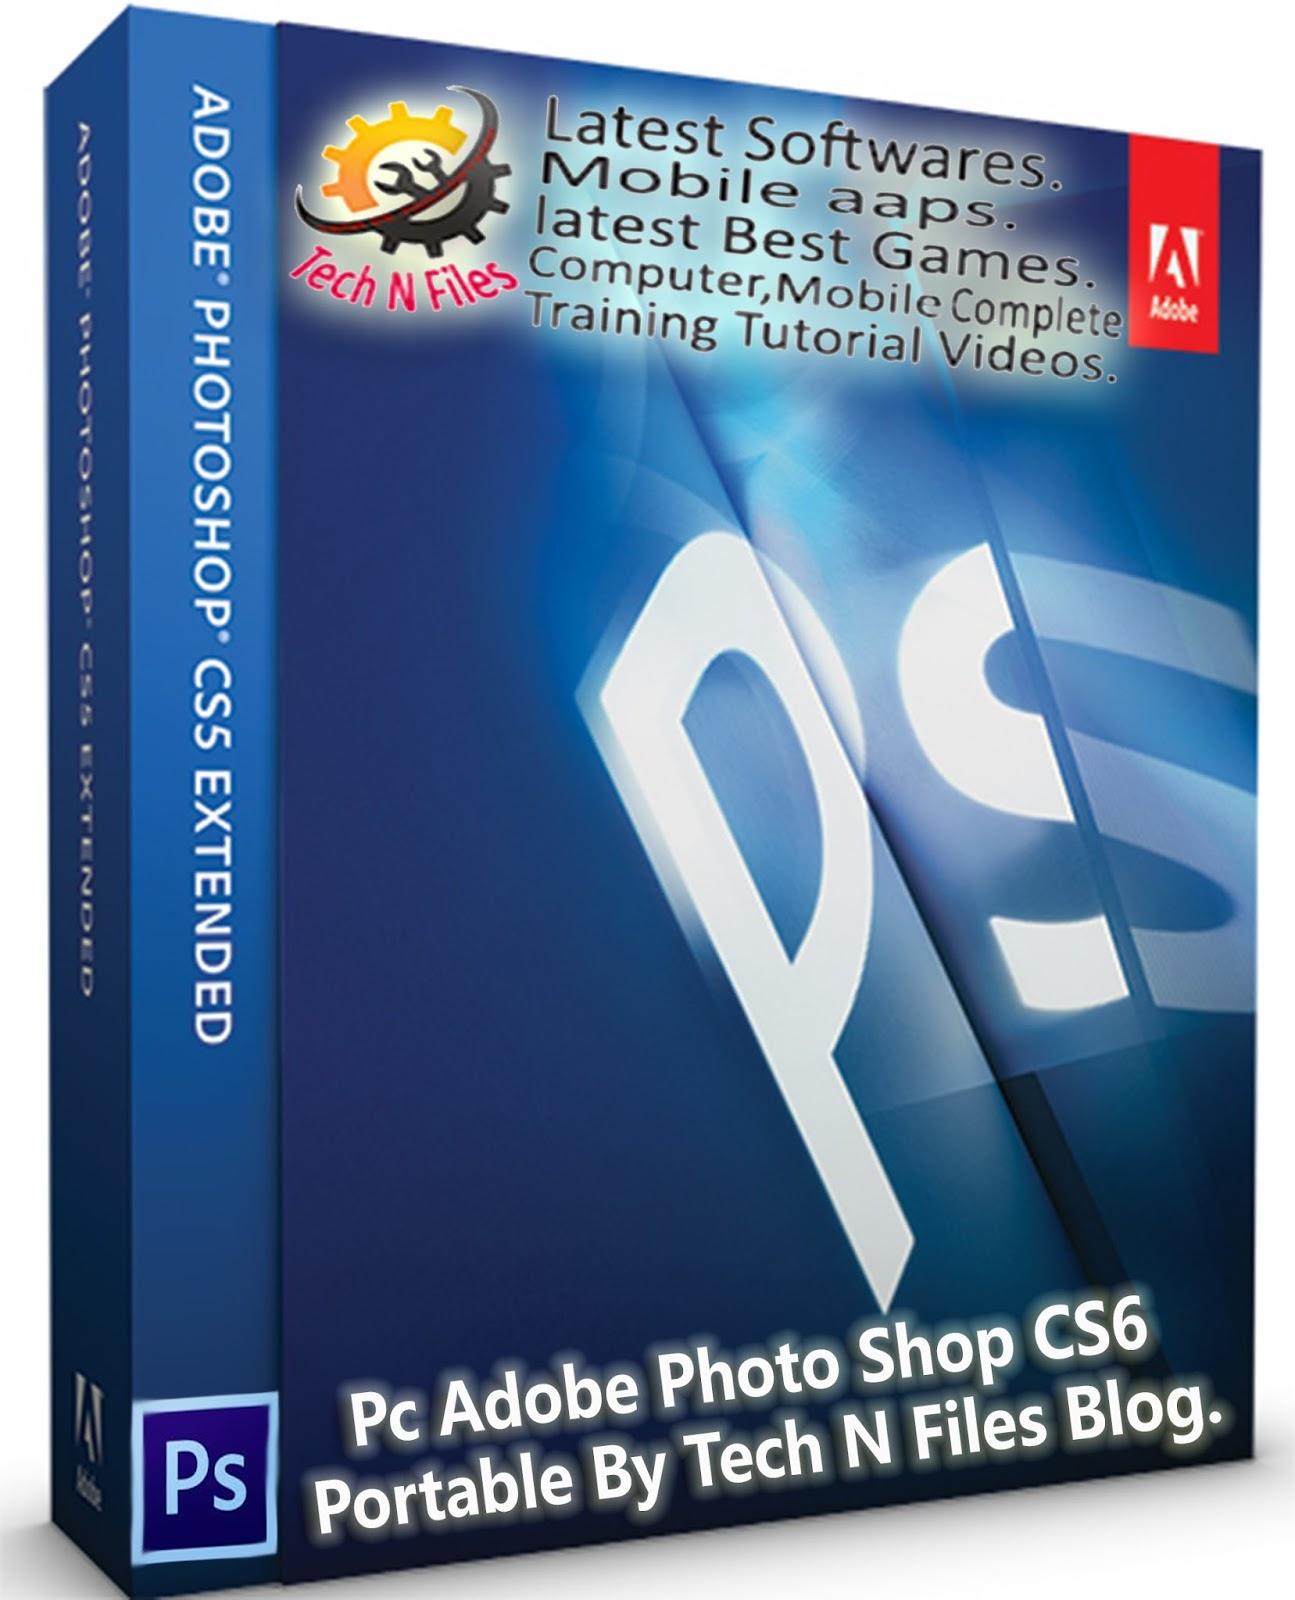 ps adobe photoshop cs6 free download full version